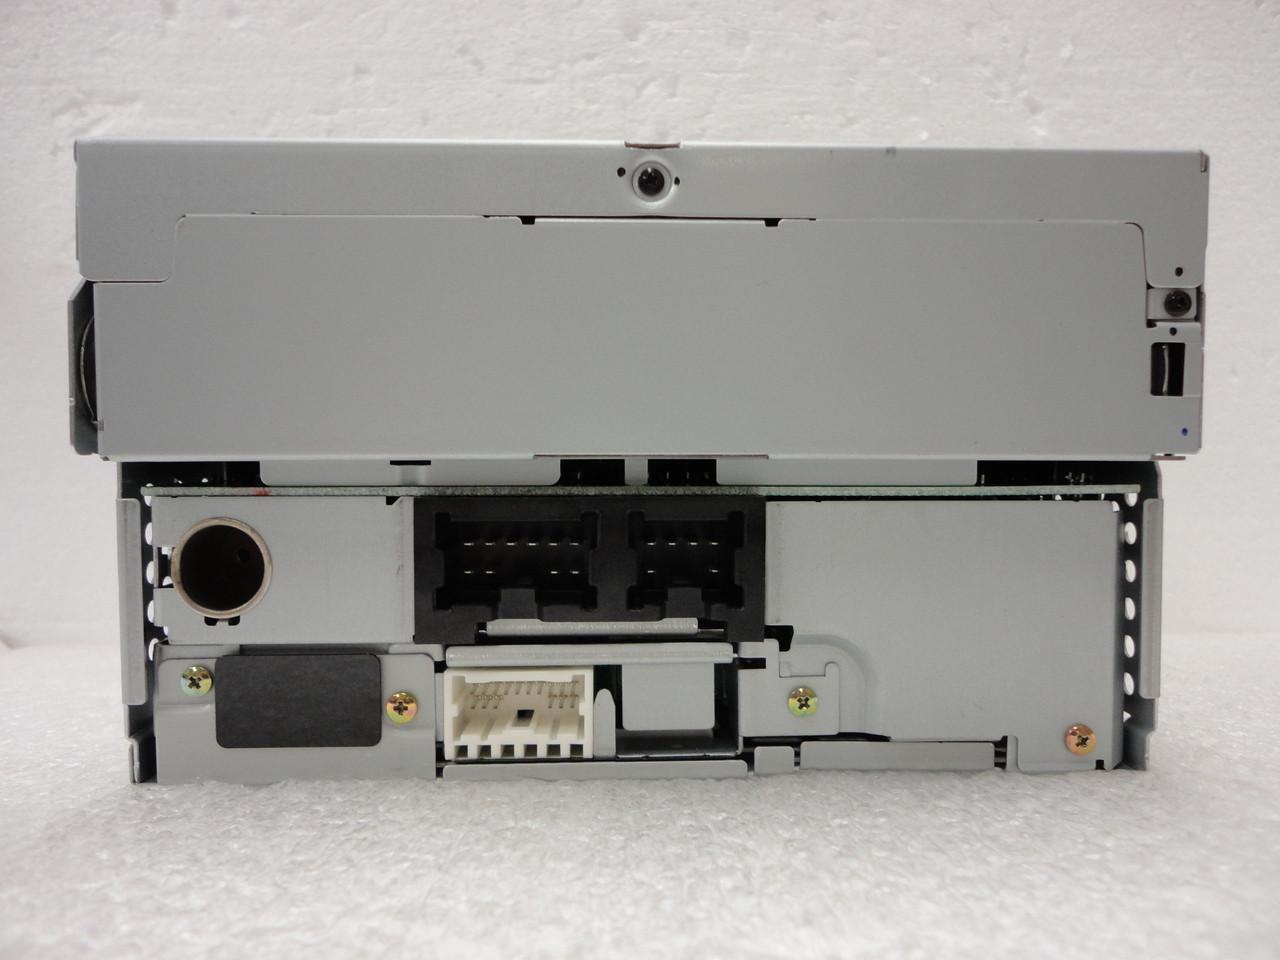 1998 nissan maxima cd player [ 1280 x 960 Pixel ]